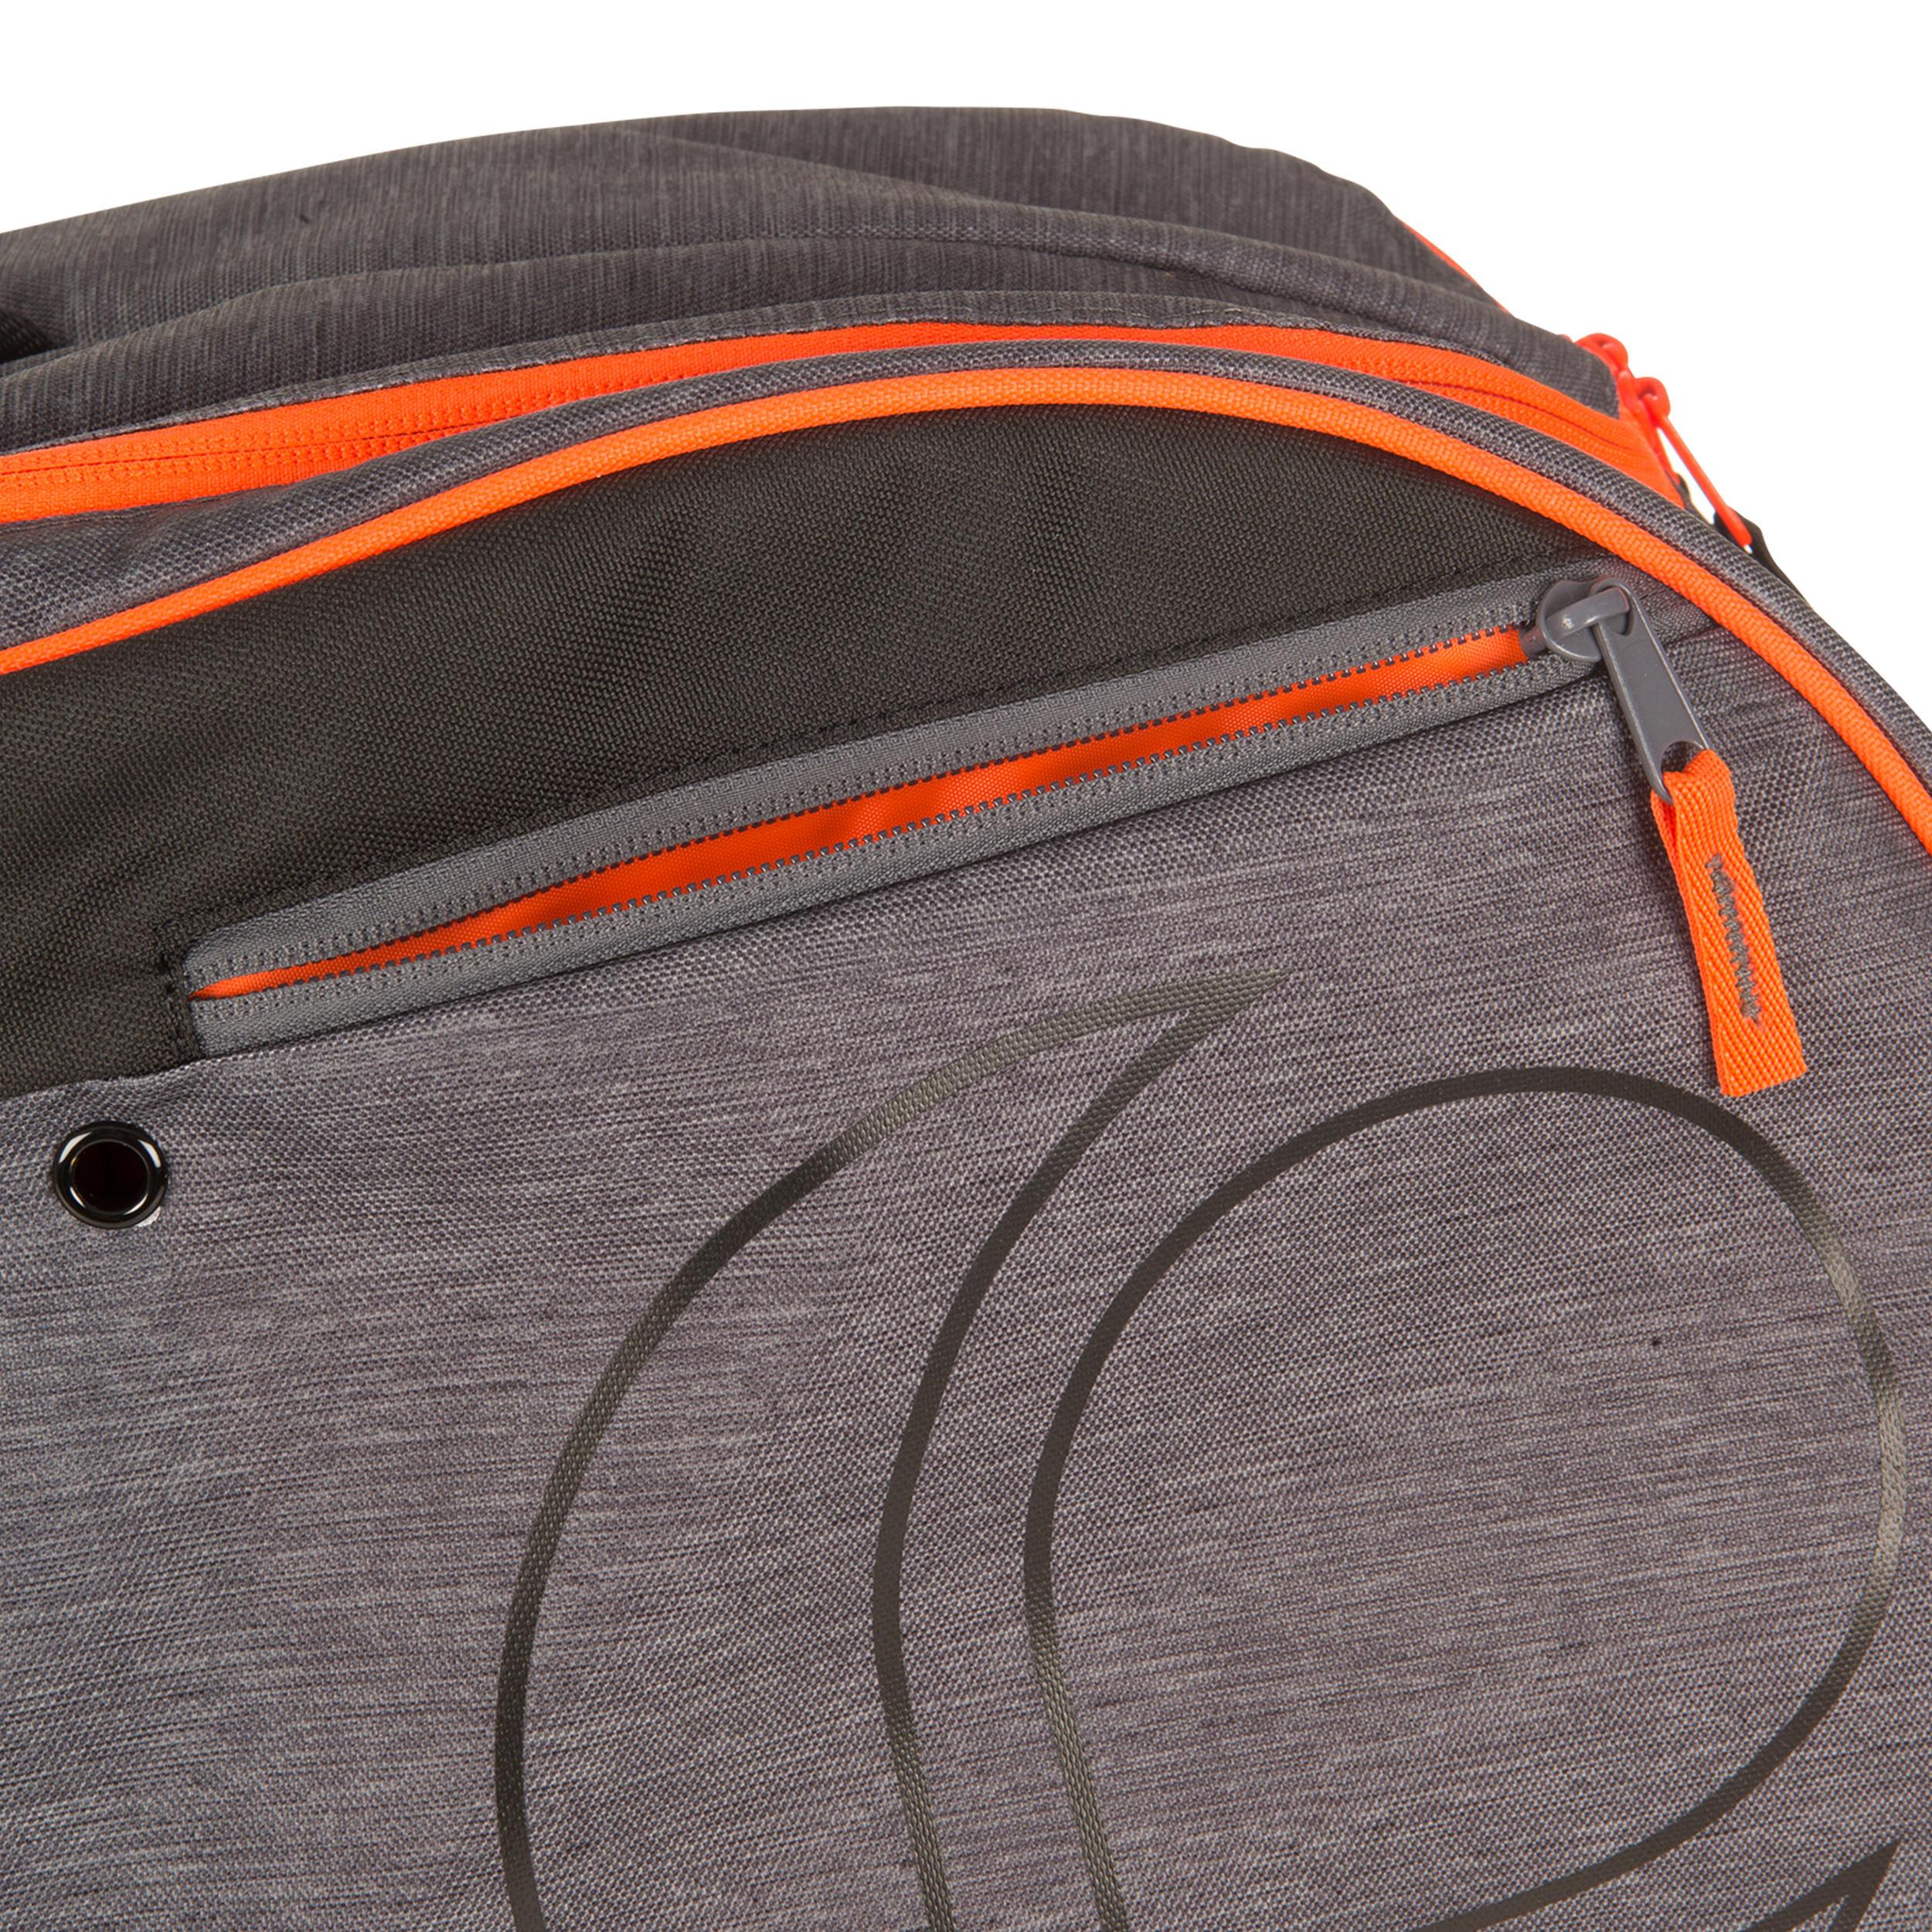 Kit Bag - Tennis/Badminton/Squash